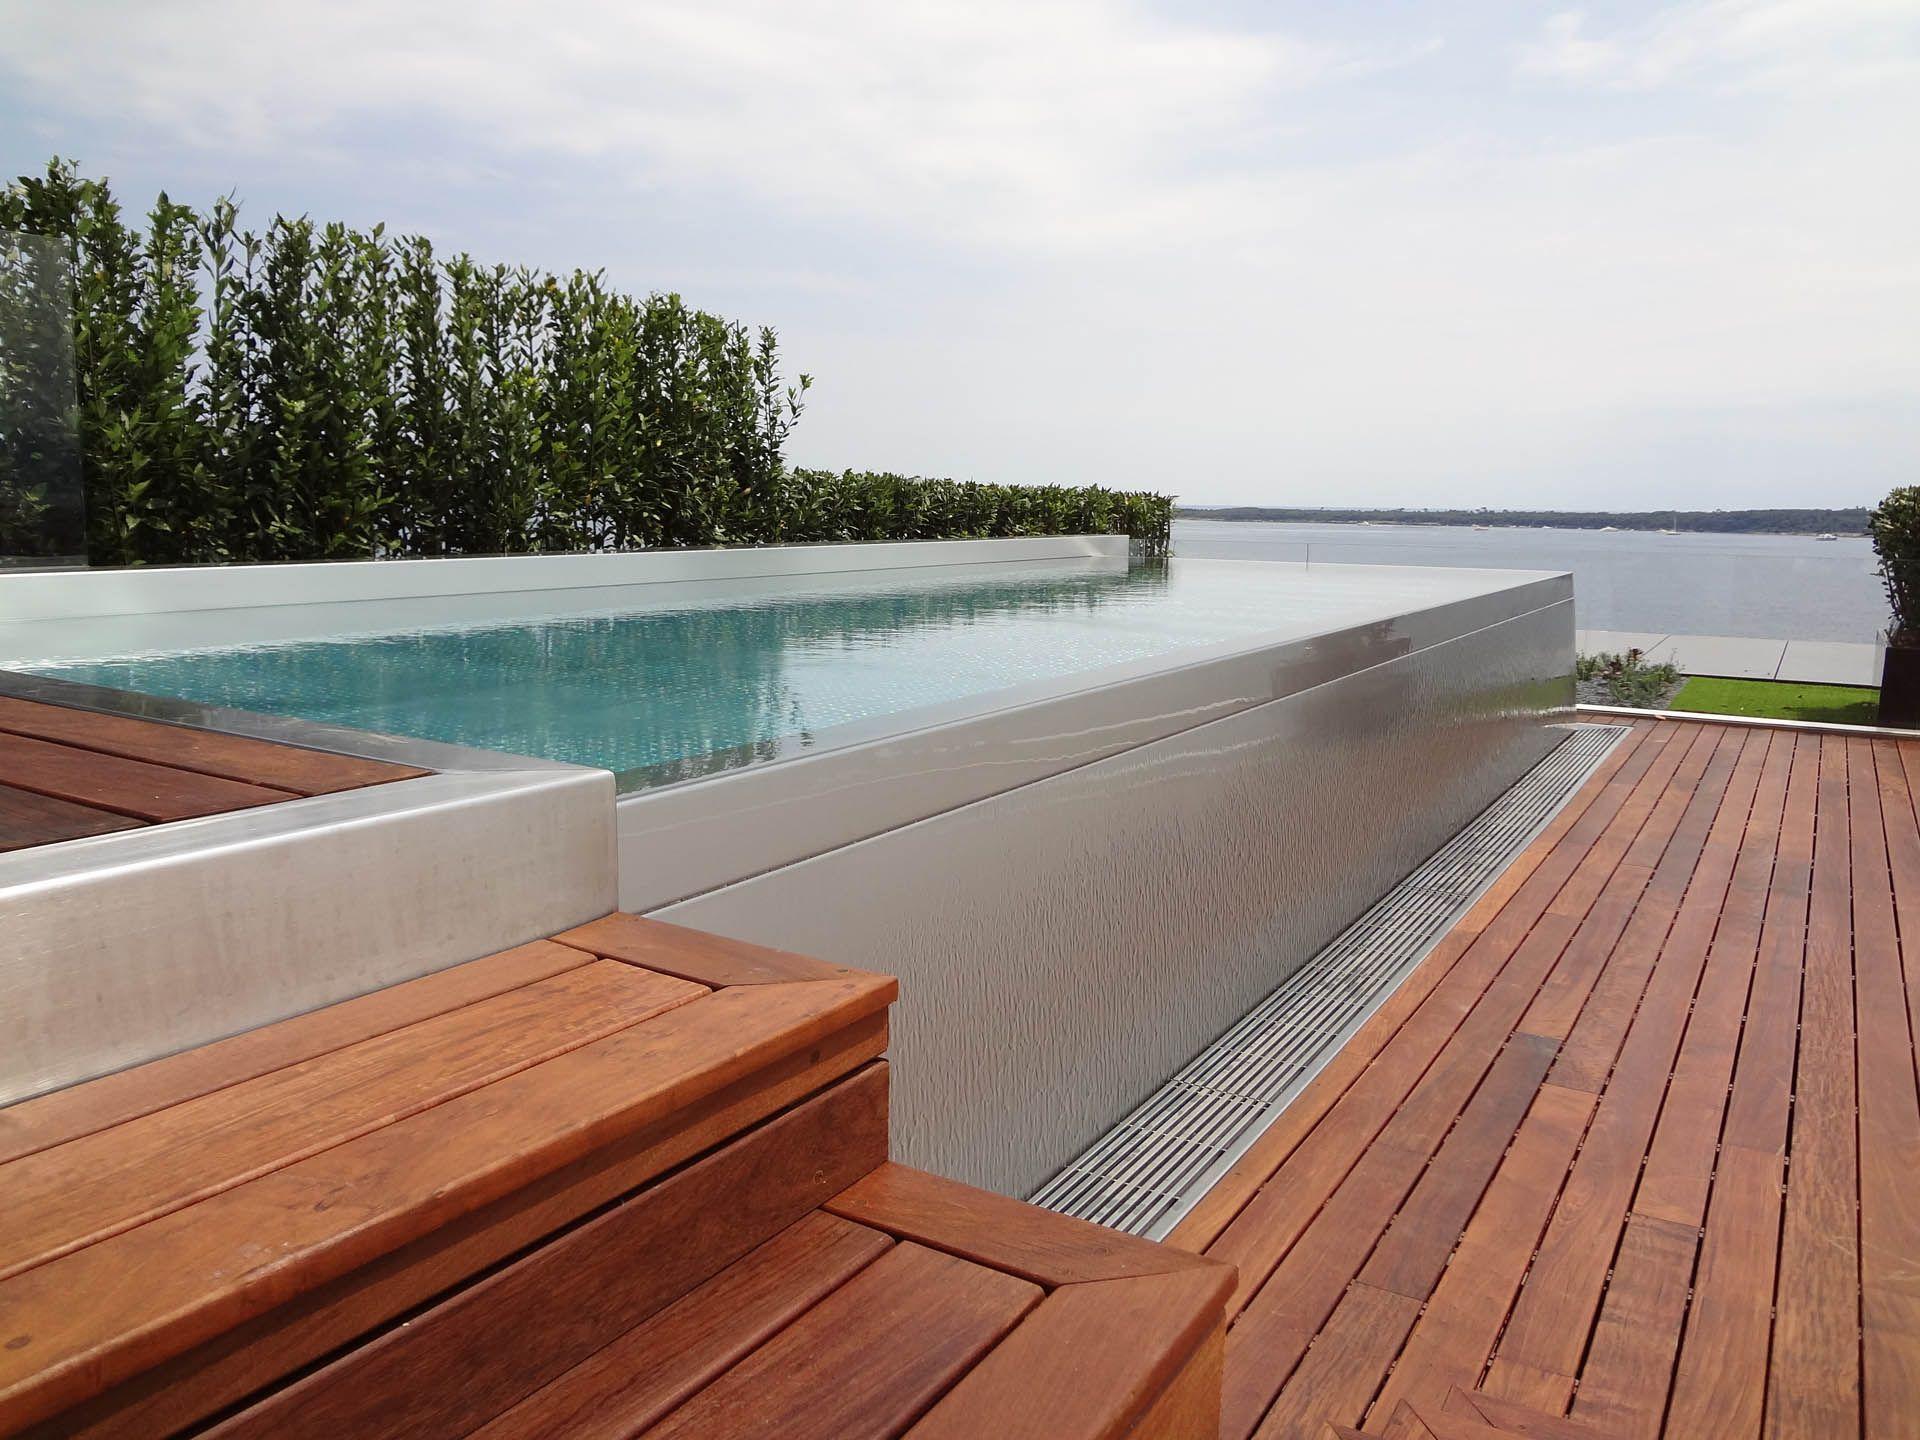 piscine inox hors sol sur terrasse avec vue sur la mer. Black Bedroom Furniture Sets. Home Design Ideas